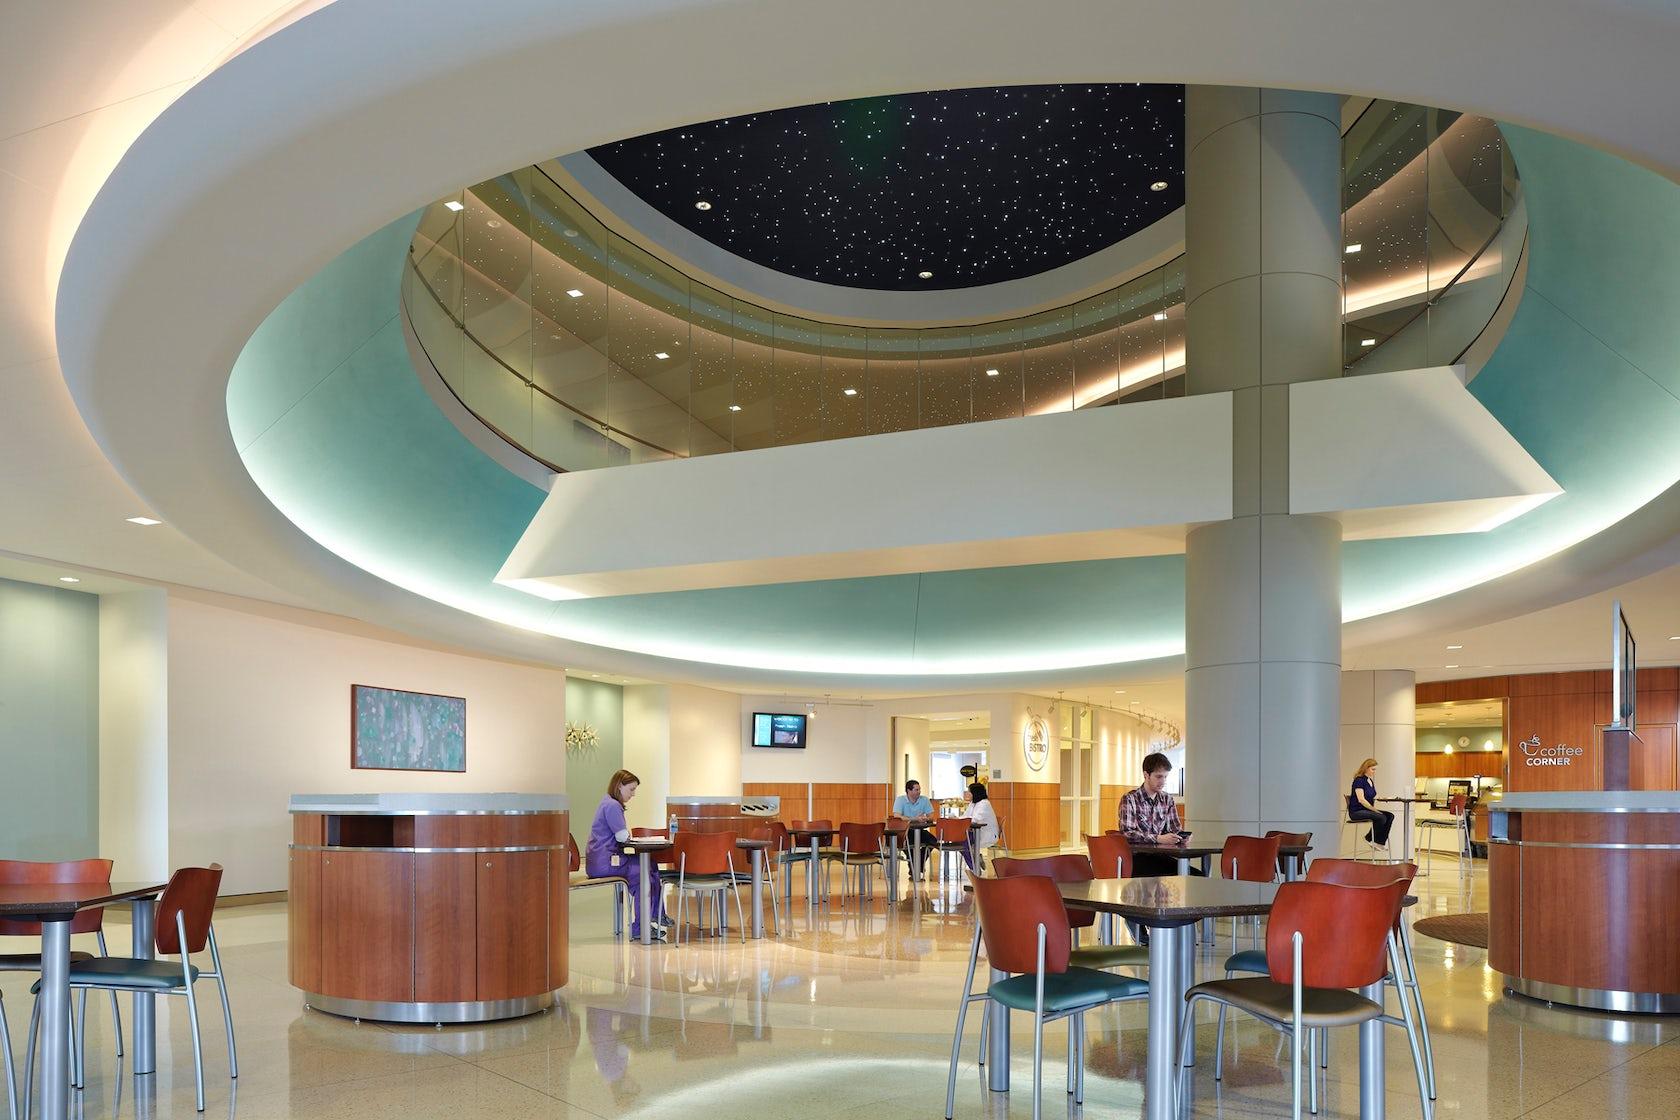 Bridge Street Auto >> Texas Children's Hospital Pavilion for Women - Architizer